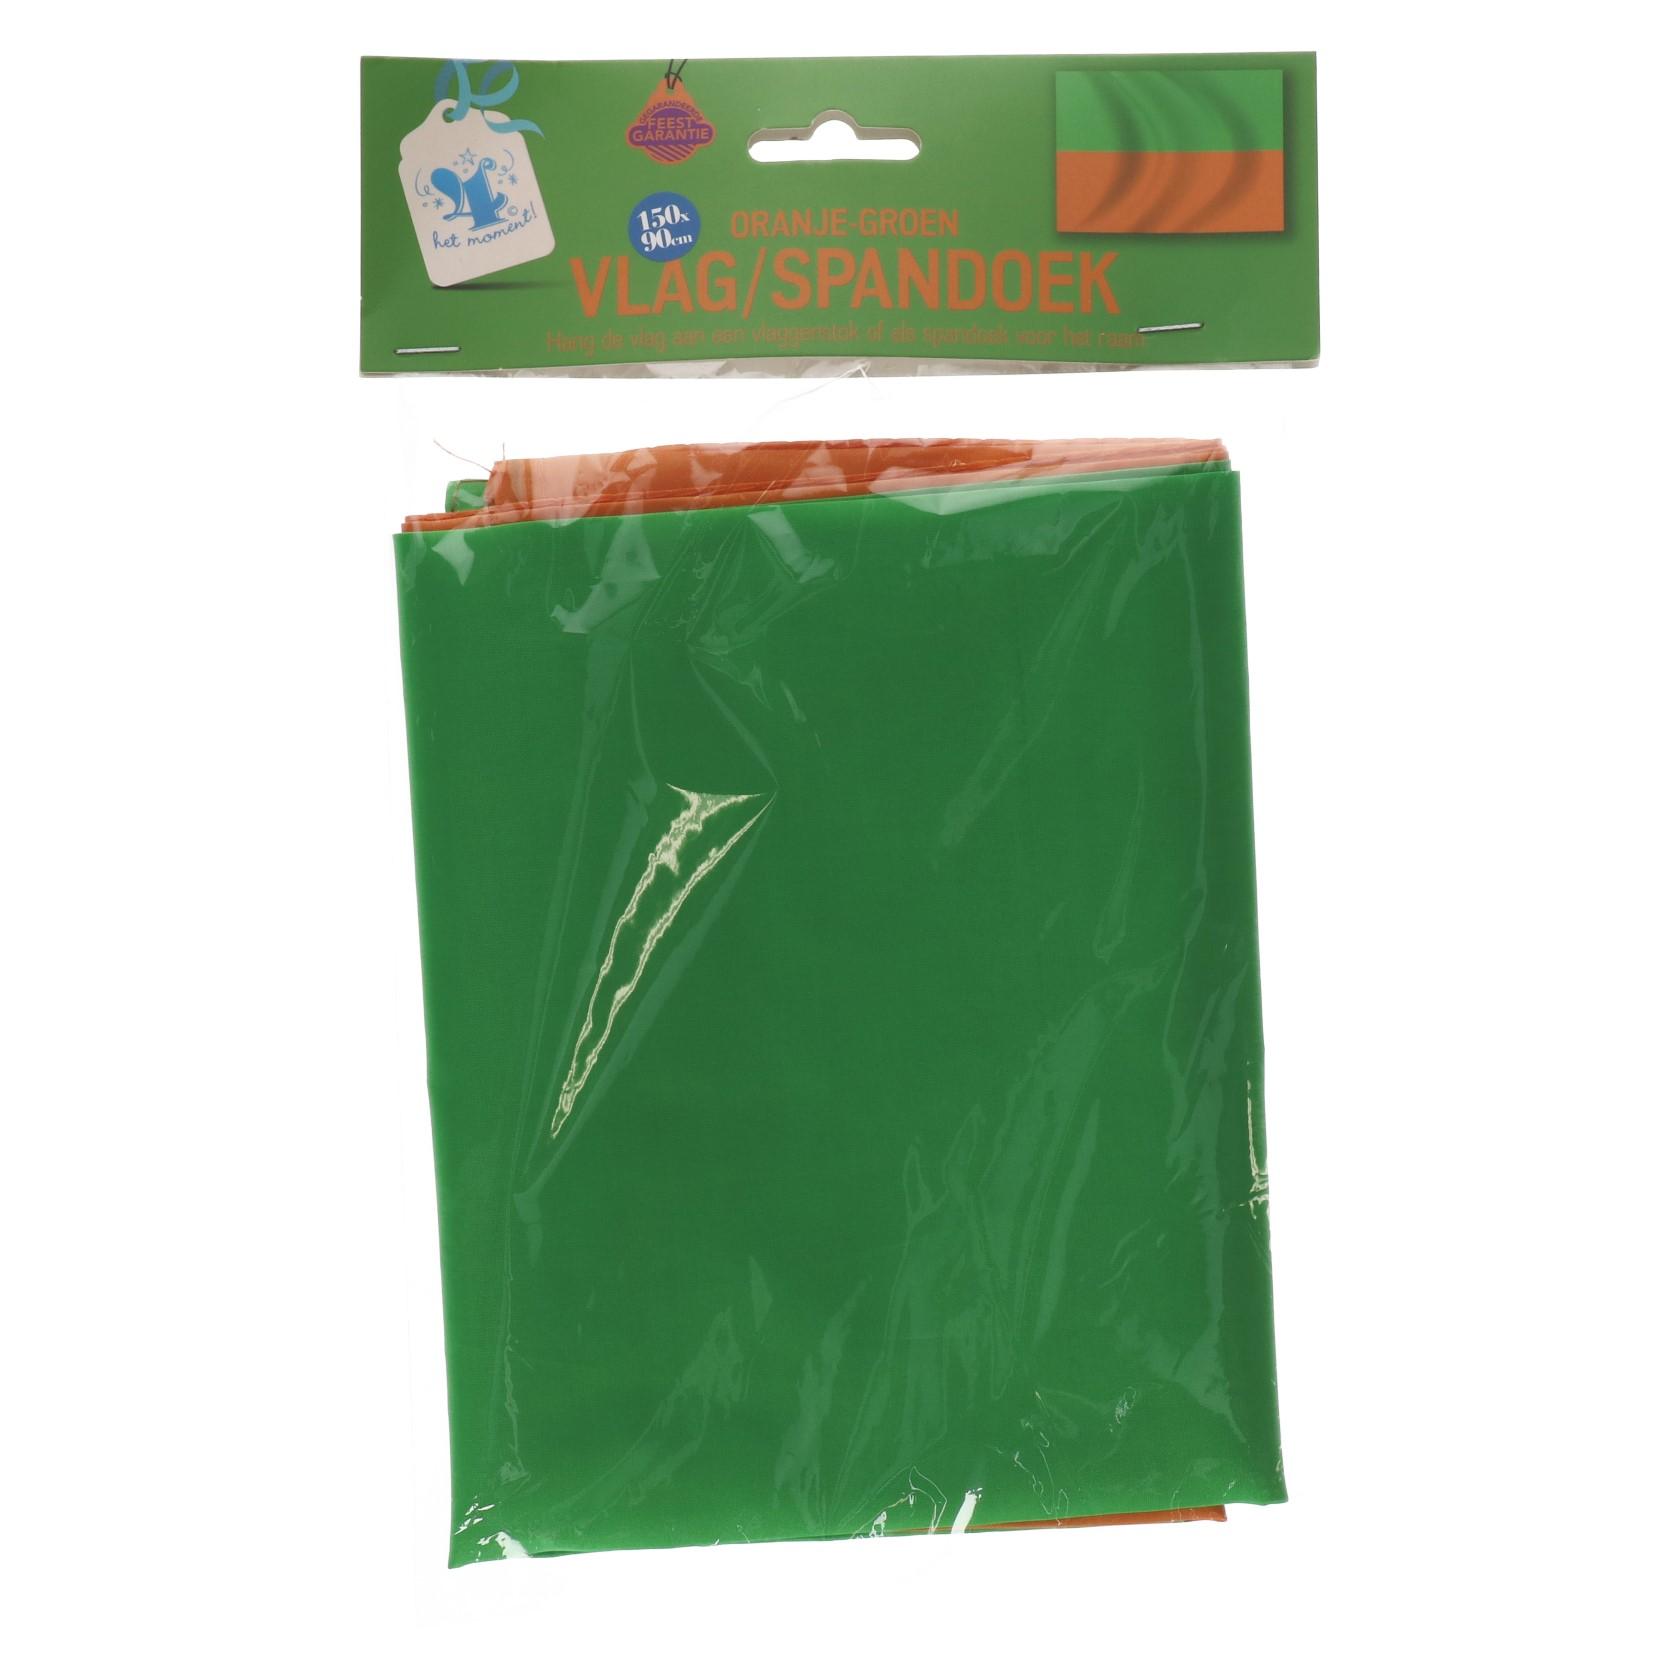 Oranje groen vlag/spandoek